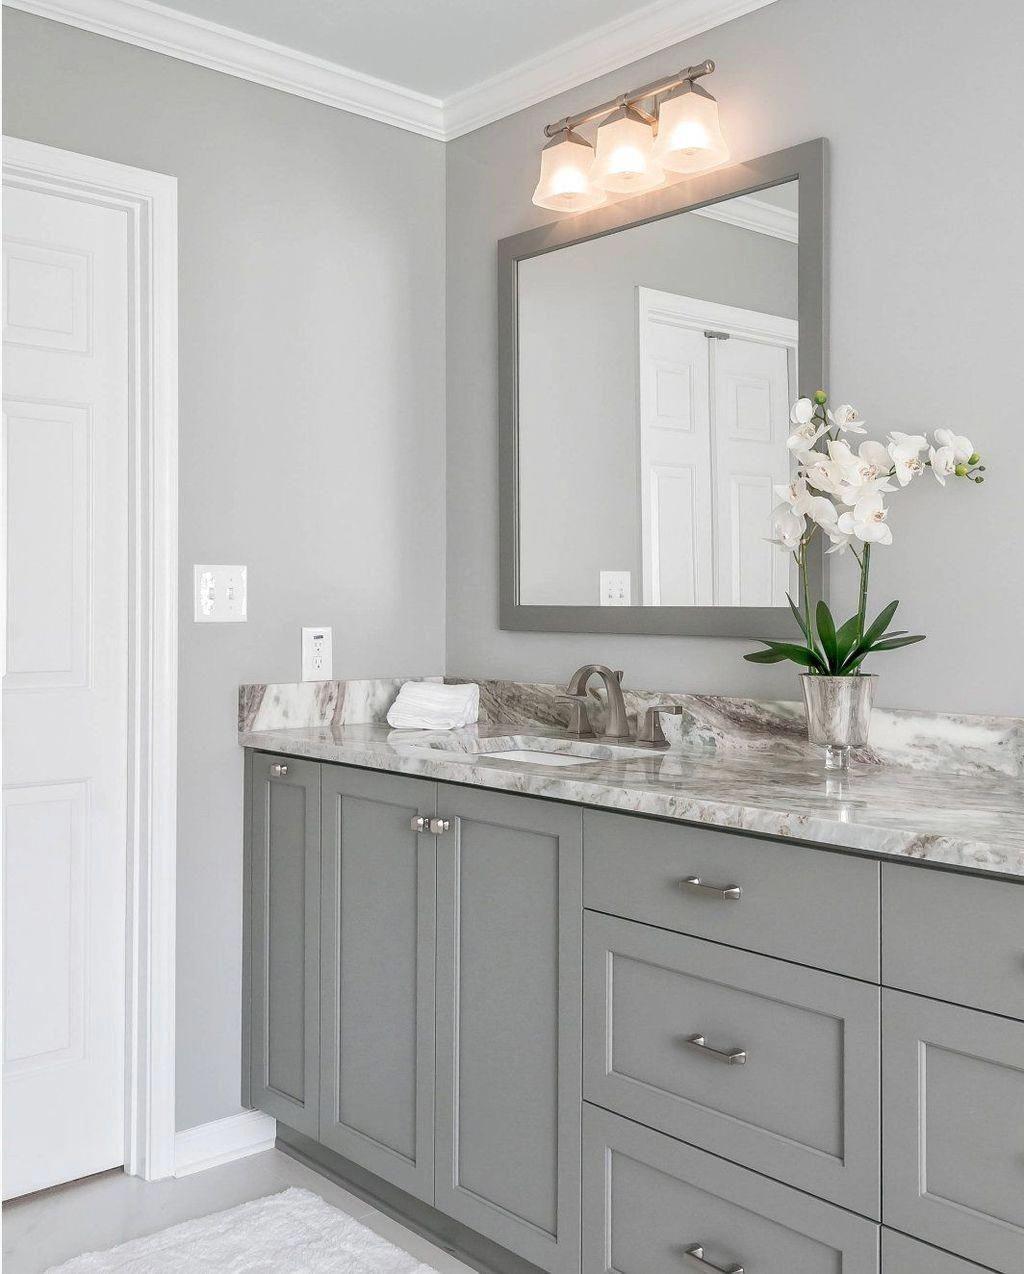 24 Sensational Ideas For Bathroomremodel Grey Bathroom Cabinets Bathroom Wall Colors Light Grey Bathrooms Light gray bathroom colors